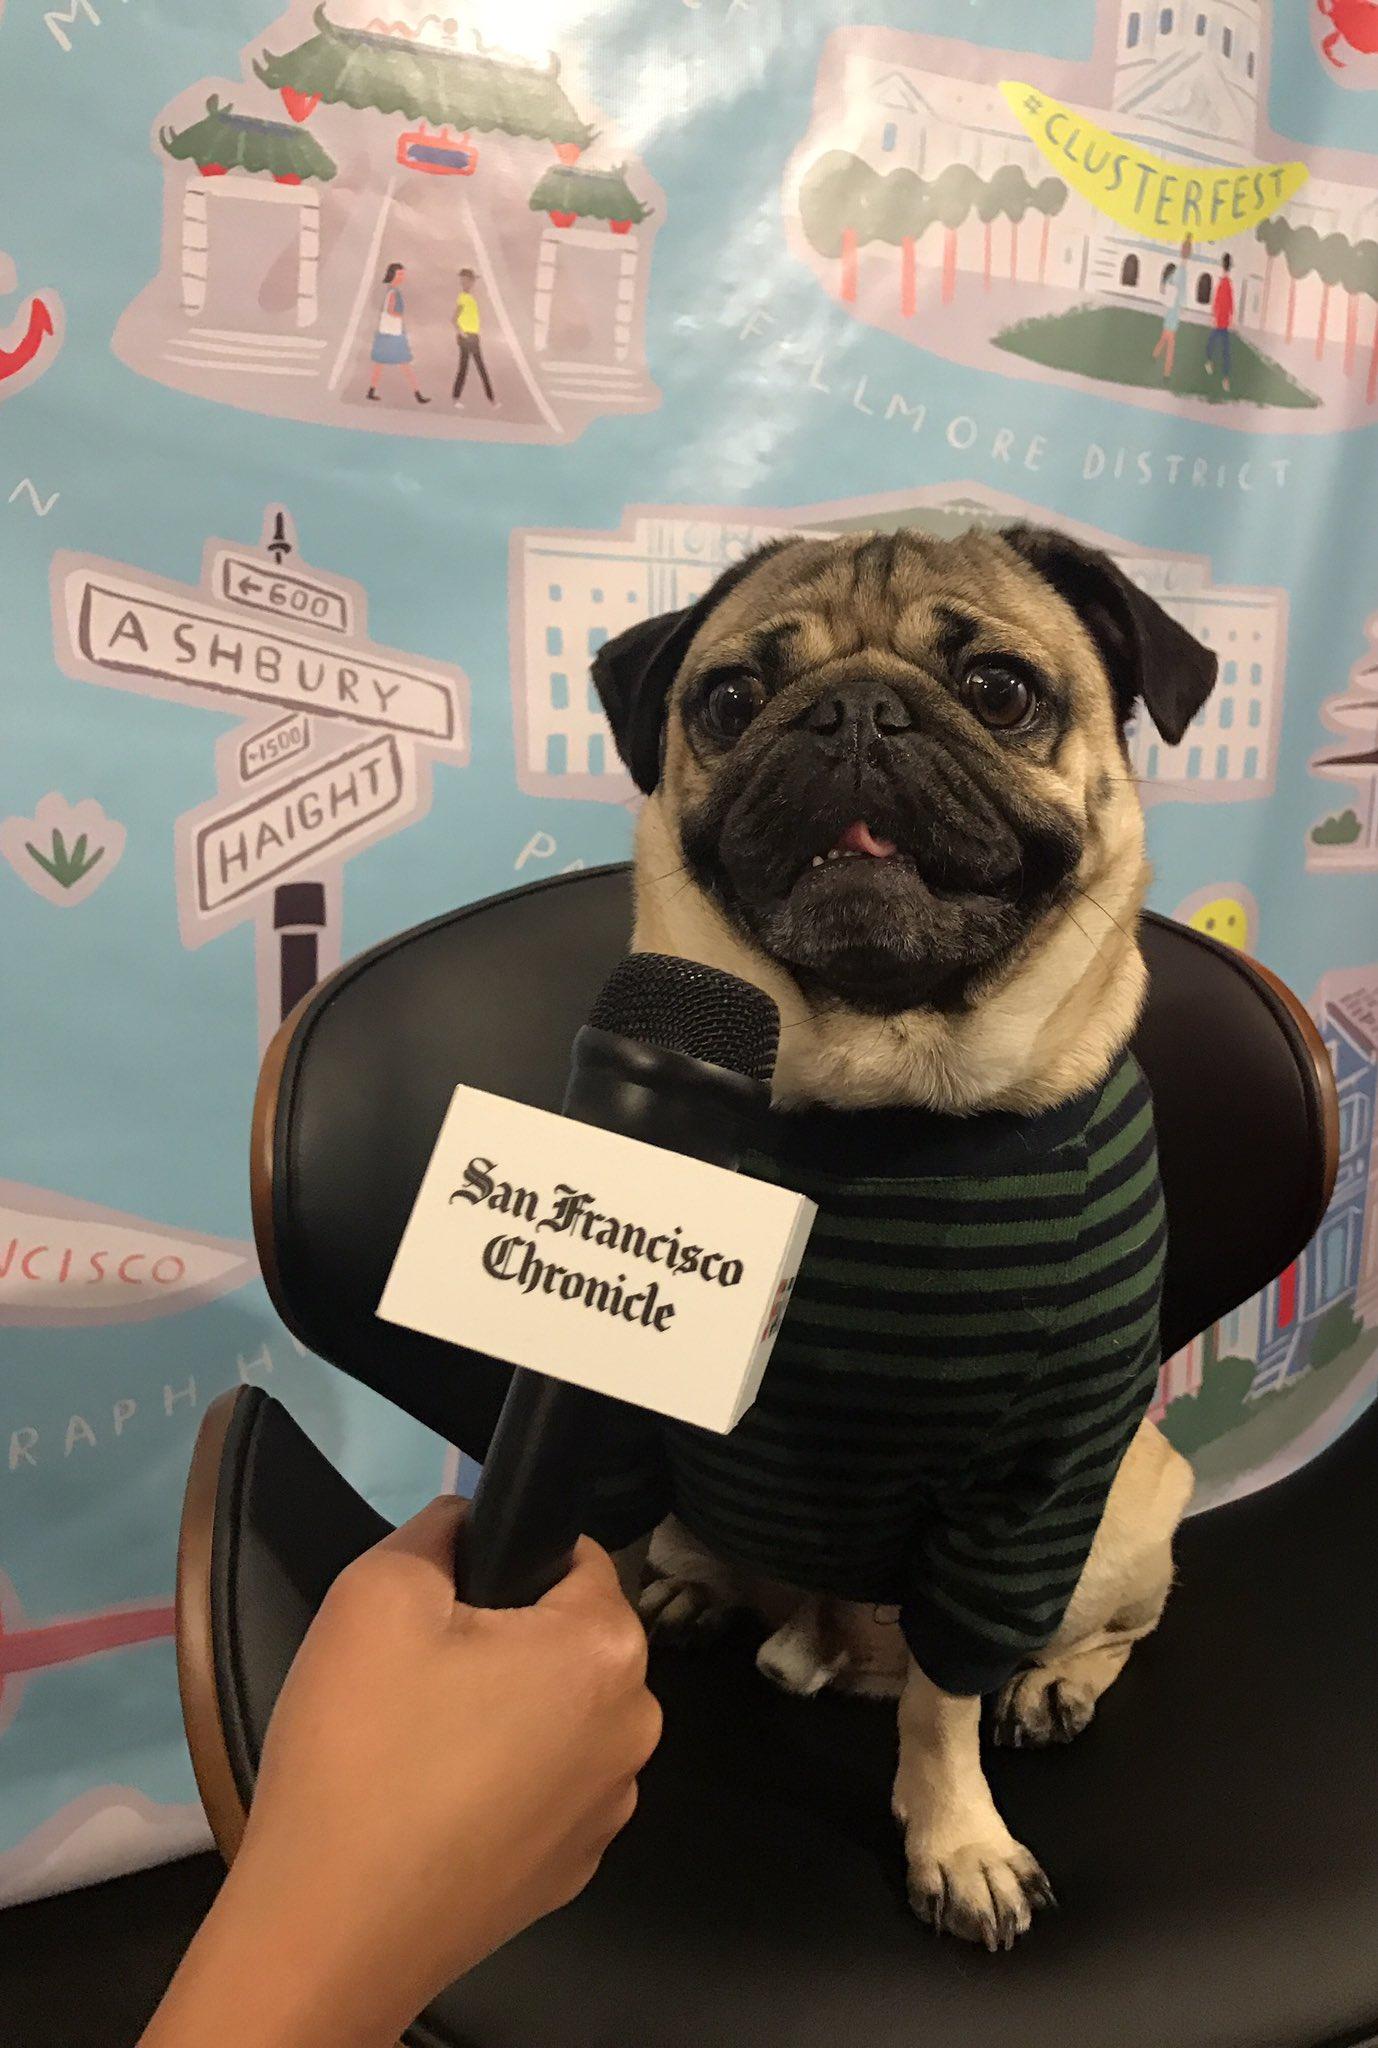 Doug the pug among celebrities at clusterfest sfgate m4hsunfo